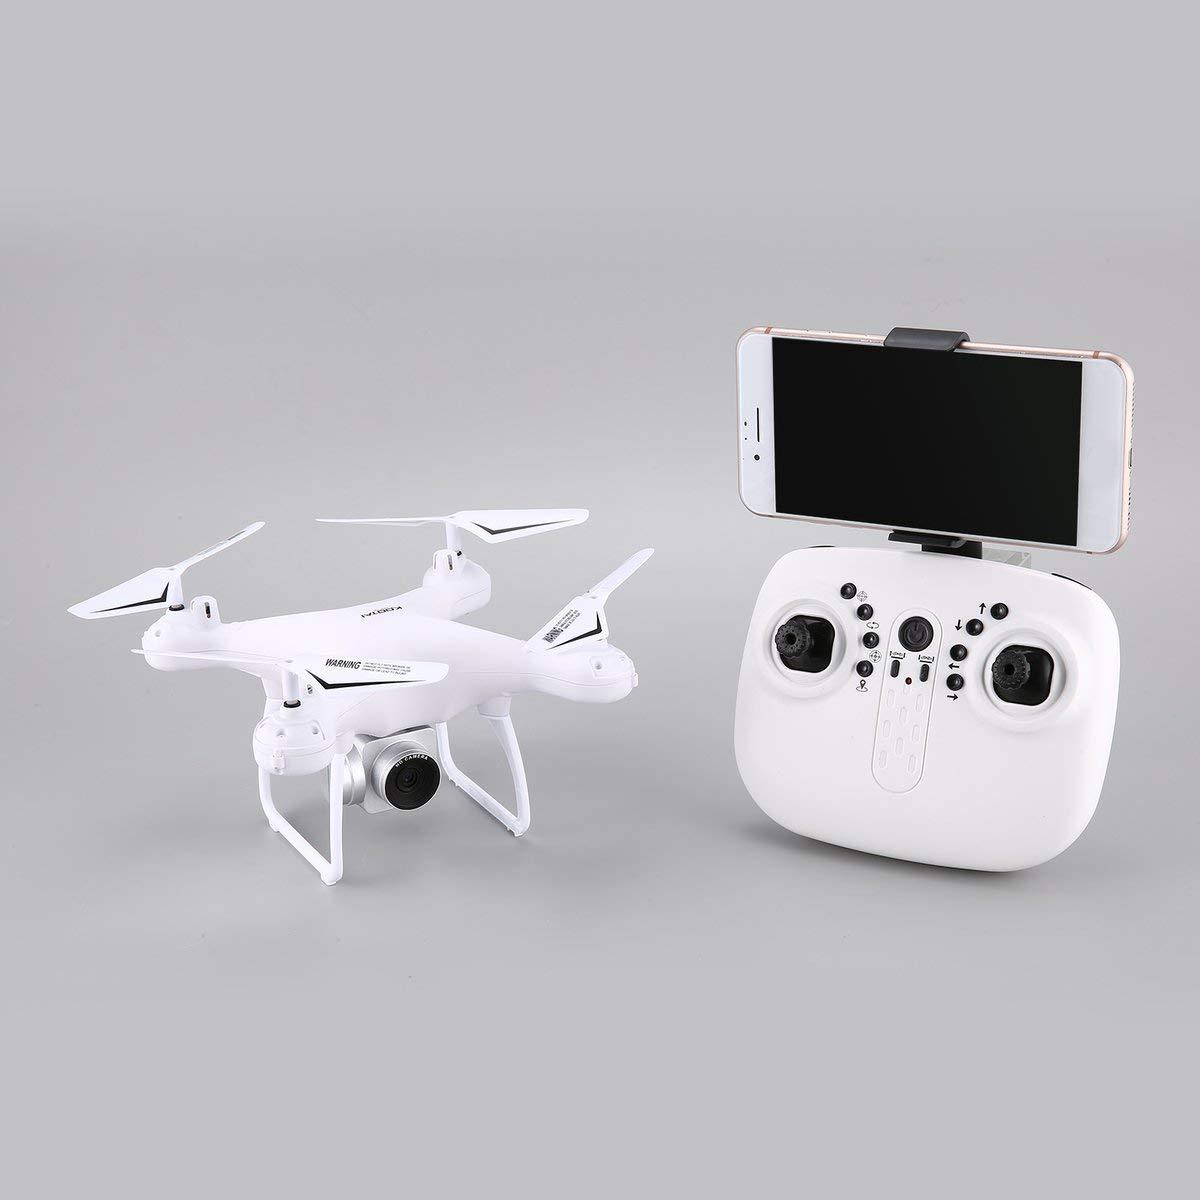 Gugutogo RC Drone KOOTAI X180 2,4G Drohne mit Kamera FPV RC Quadcopter Drohne UAV mit 720P HD Kamera Höhe Halten Headless Modus 3D-Flip 18 Minuten Langen Flug